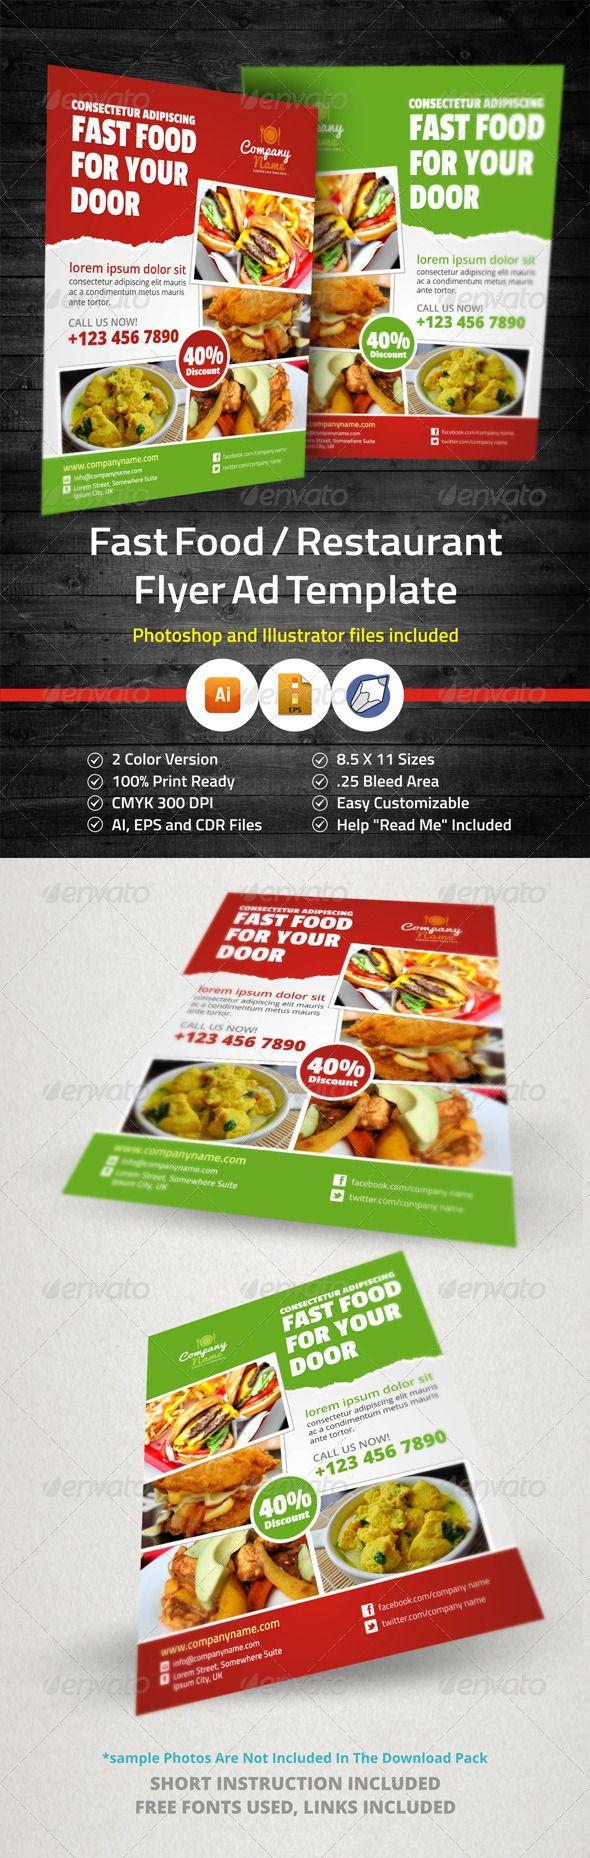 Food Menu Restaurants Flyer Ad Design V  Fast Food Restaurant